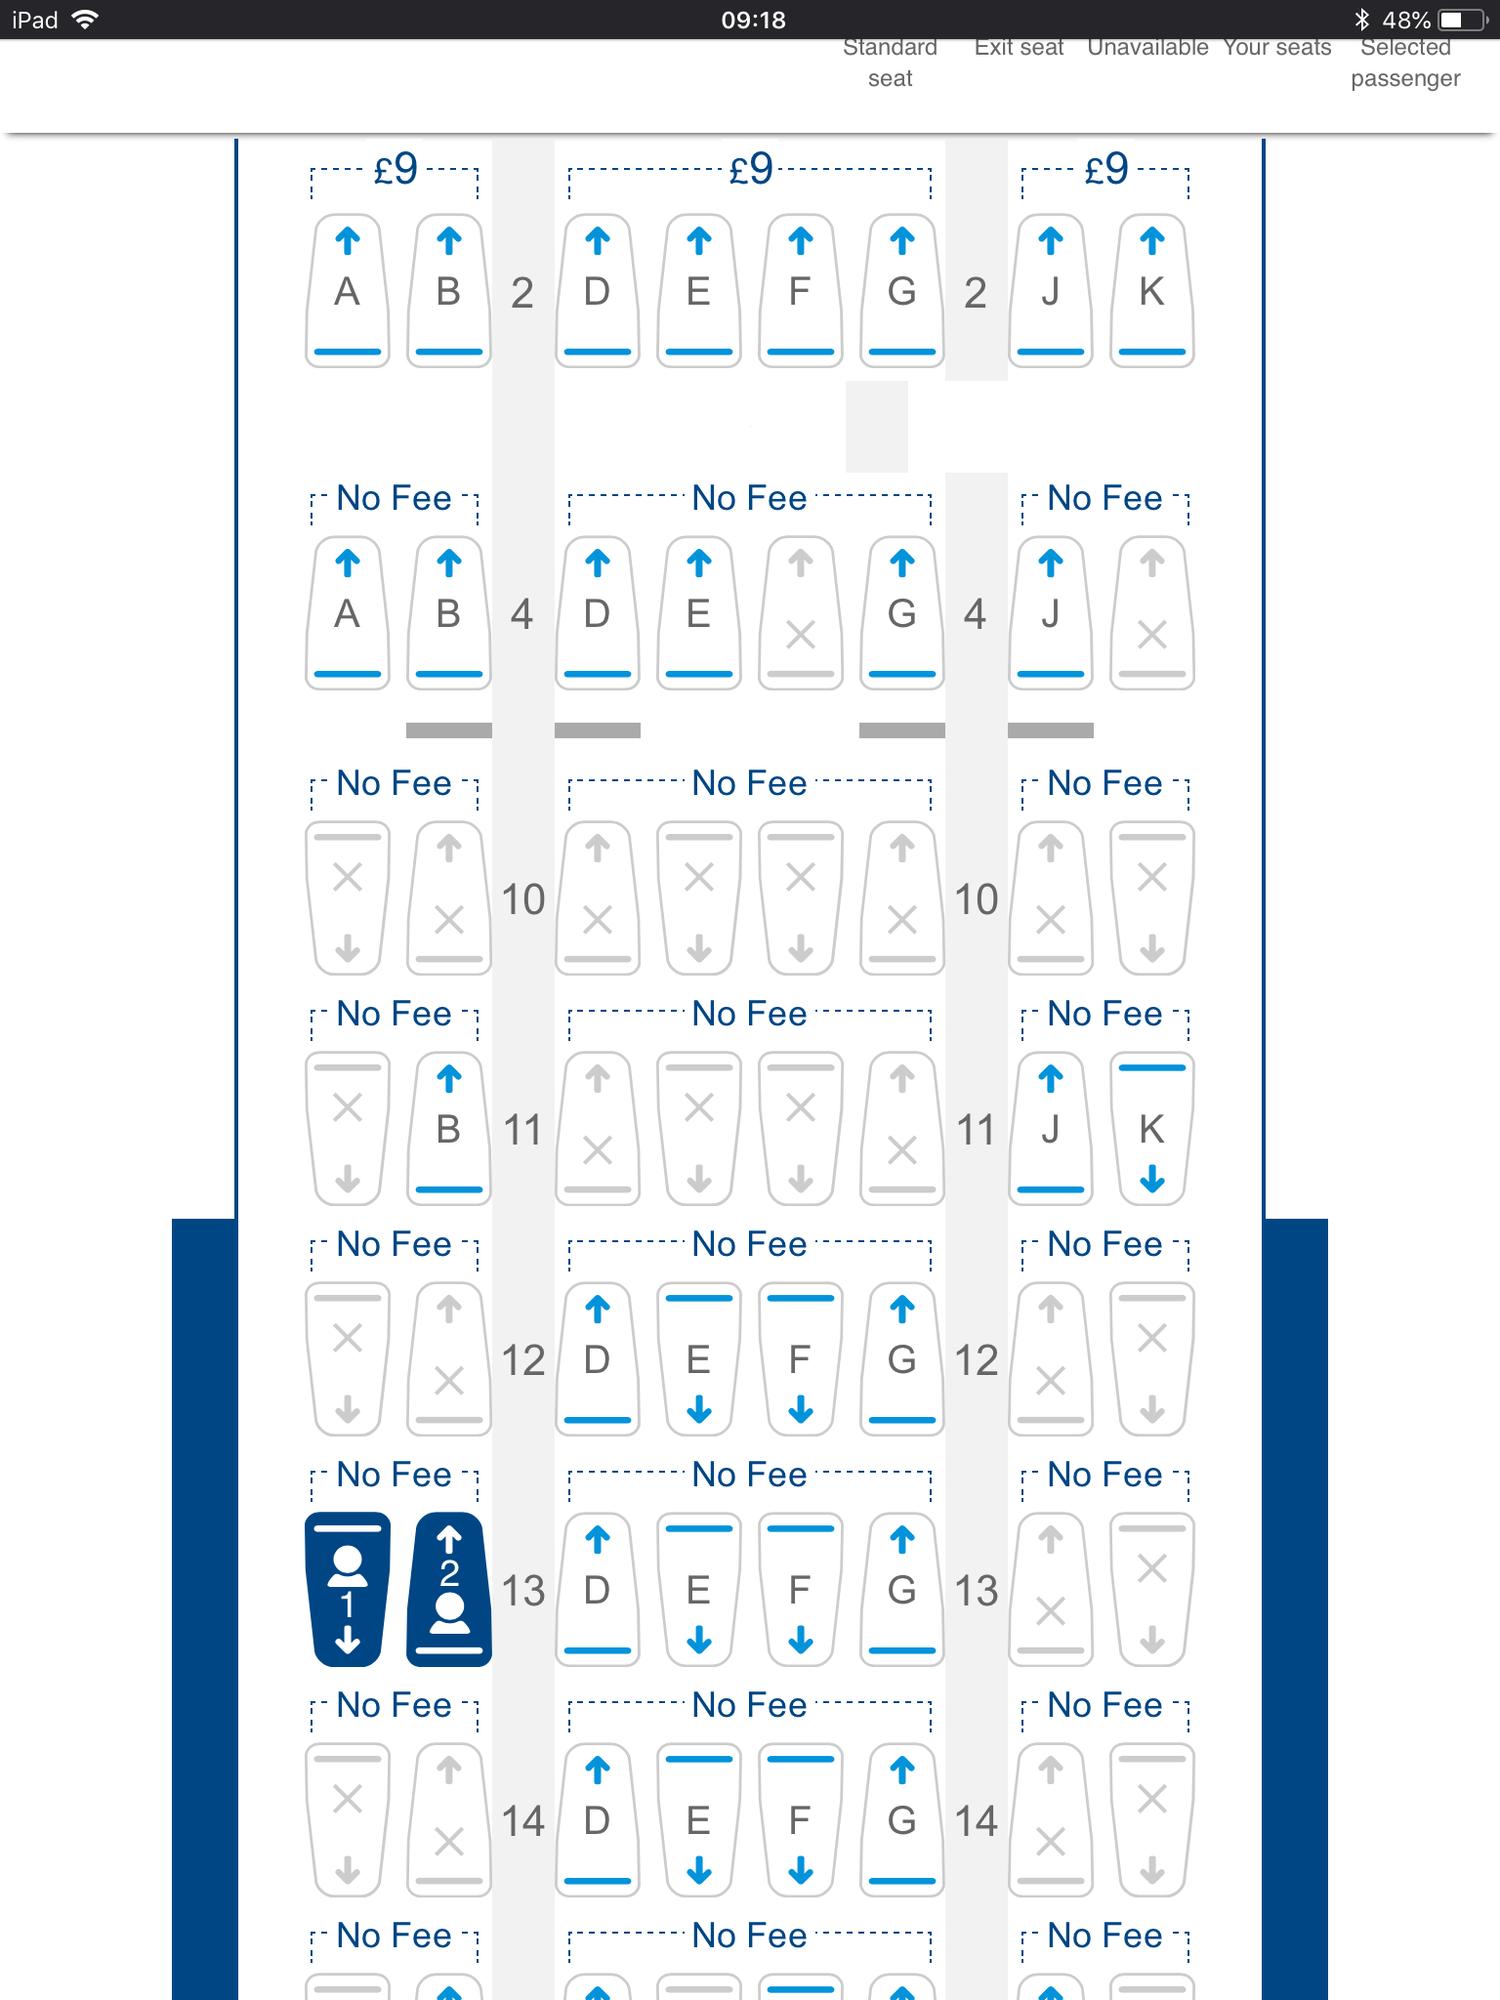 Strange 777 cw seat map - FlyerTalk Forums on 777 seat plan, 777 seat diagram, delta a380 seating map, 777 seat profile, 777 seat configuration,